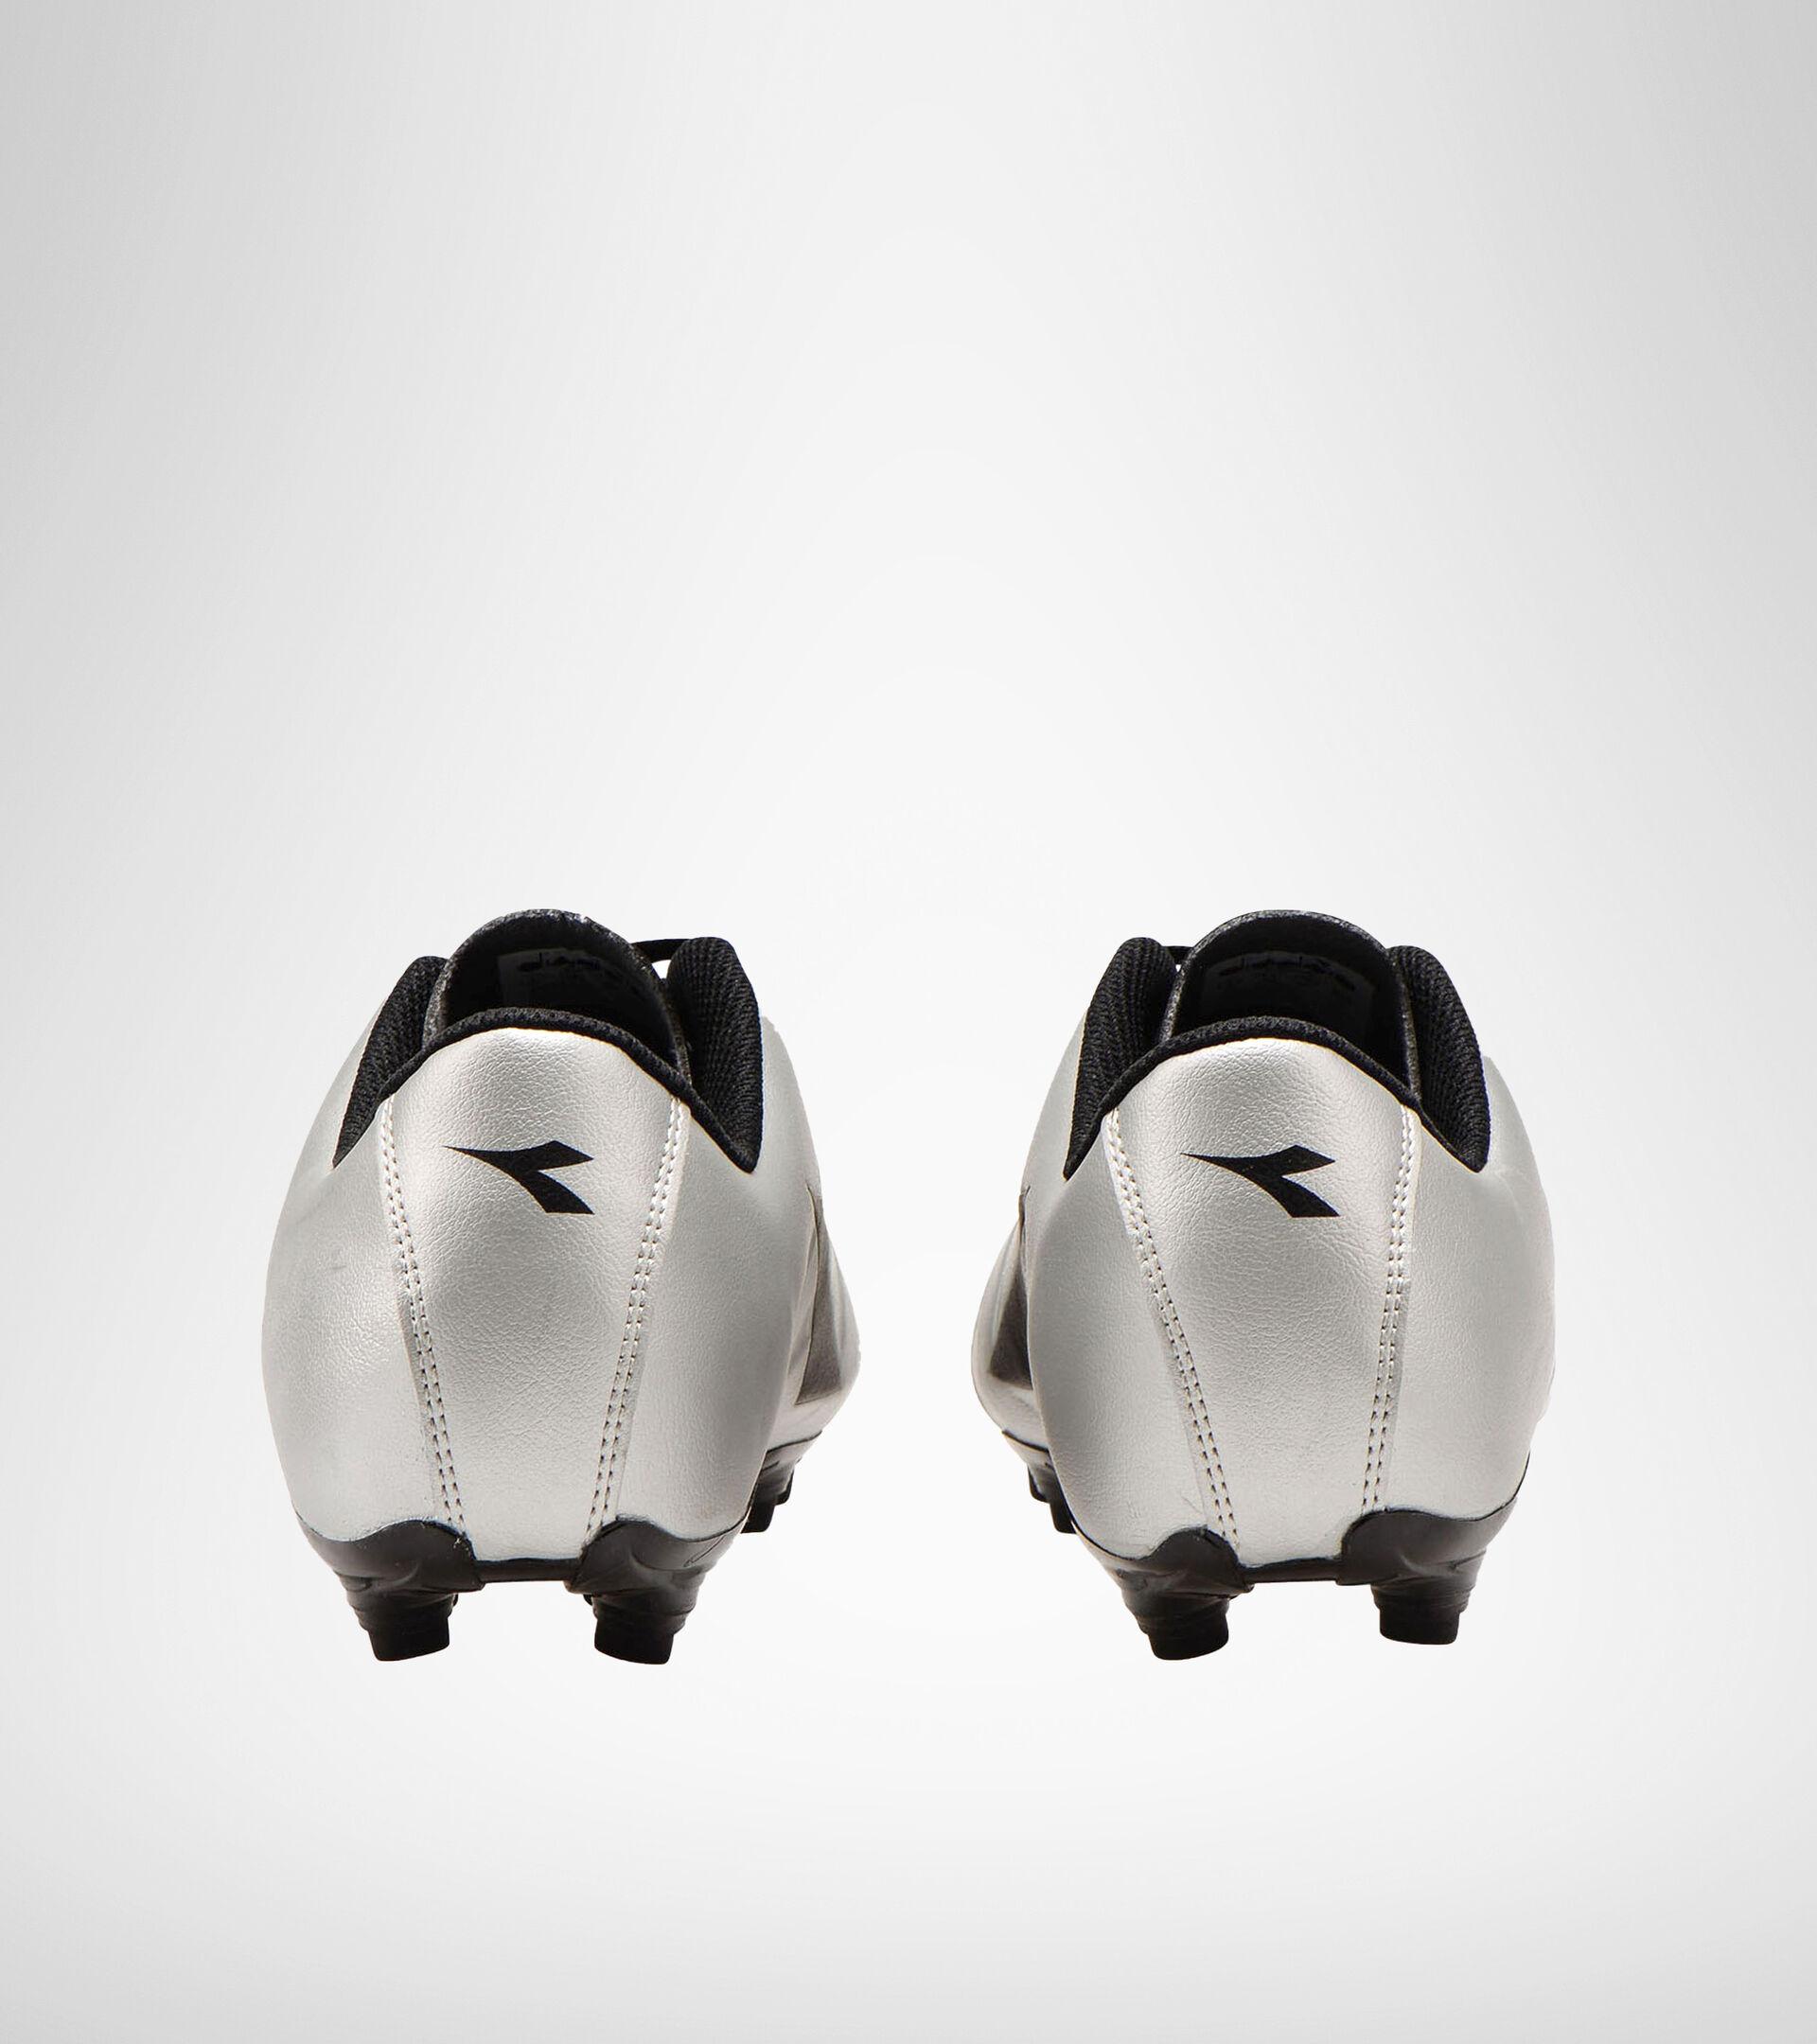 Footwear Sport UOMO PICHICHI 3 MG14 ARGENTO DD/NERO Diadora